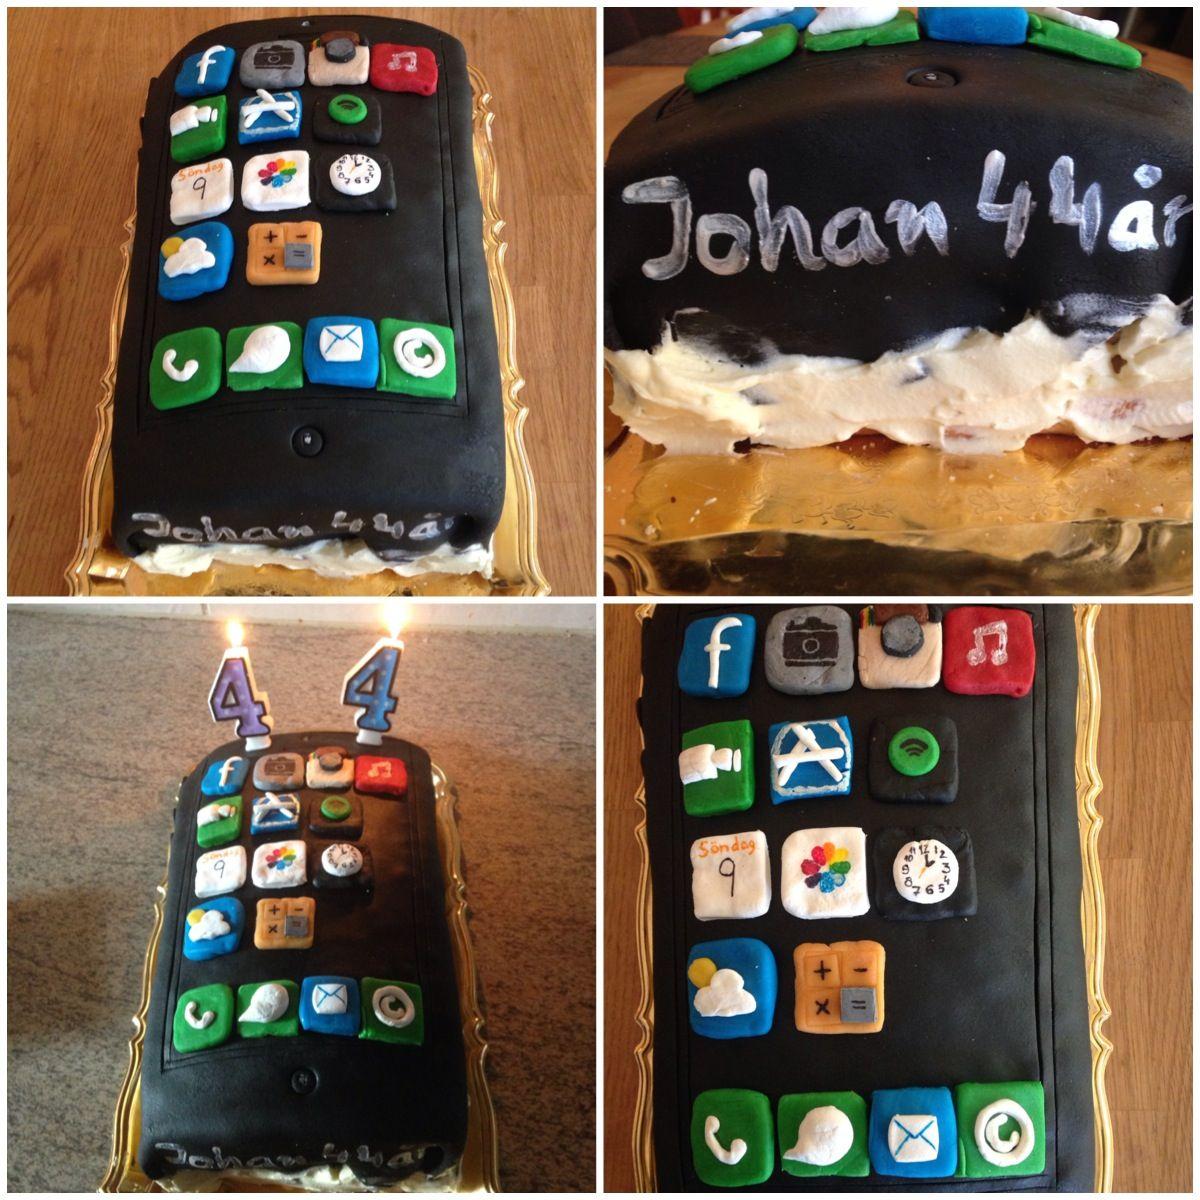 födelsedag app Iphonecake, Iphone, cake, birthday cake, Iphonebirthdaycake  födelsedag app